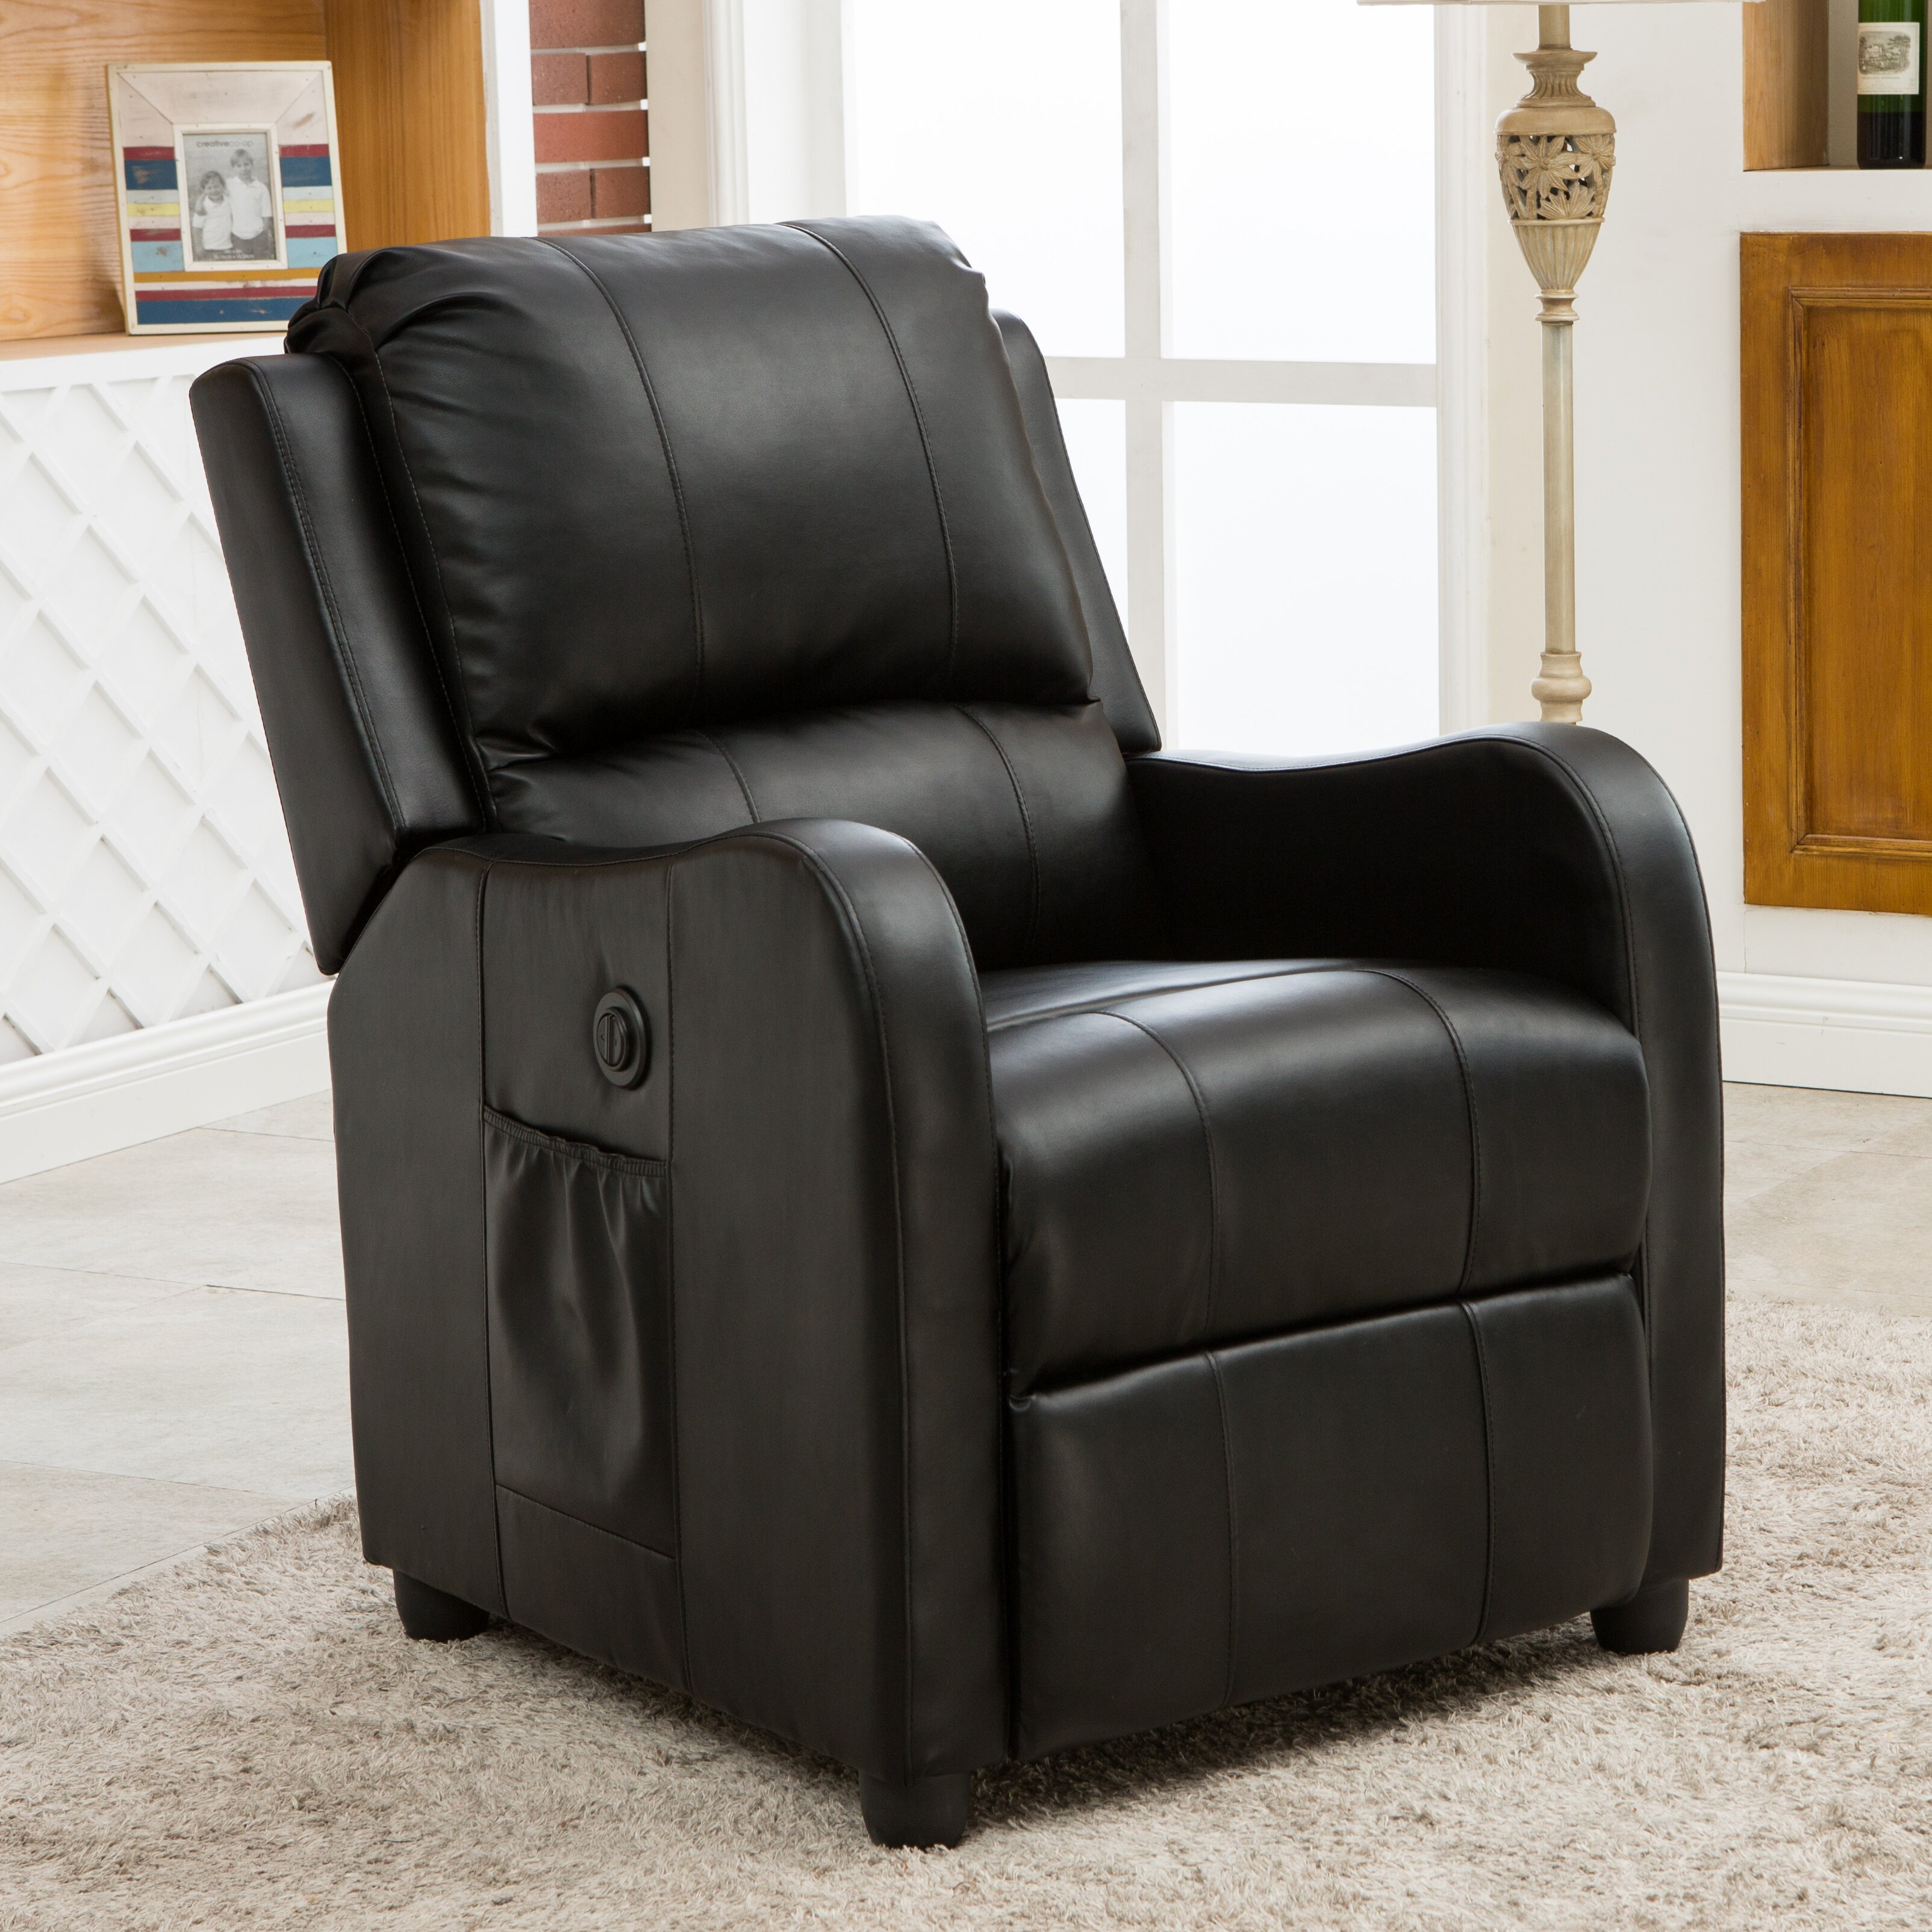 Wildon home denali power recliner reviews wayfair for Electric recliners reviews